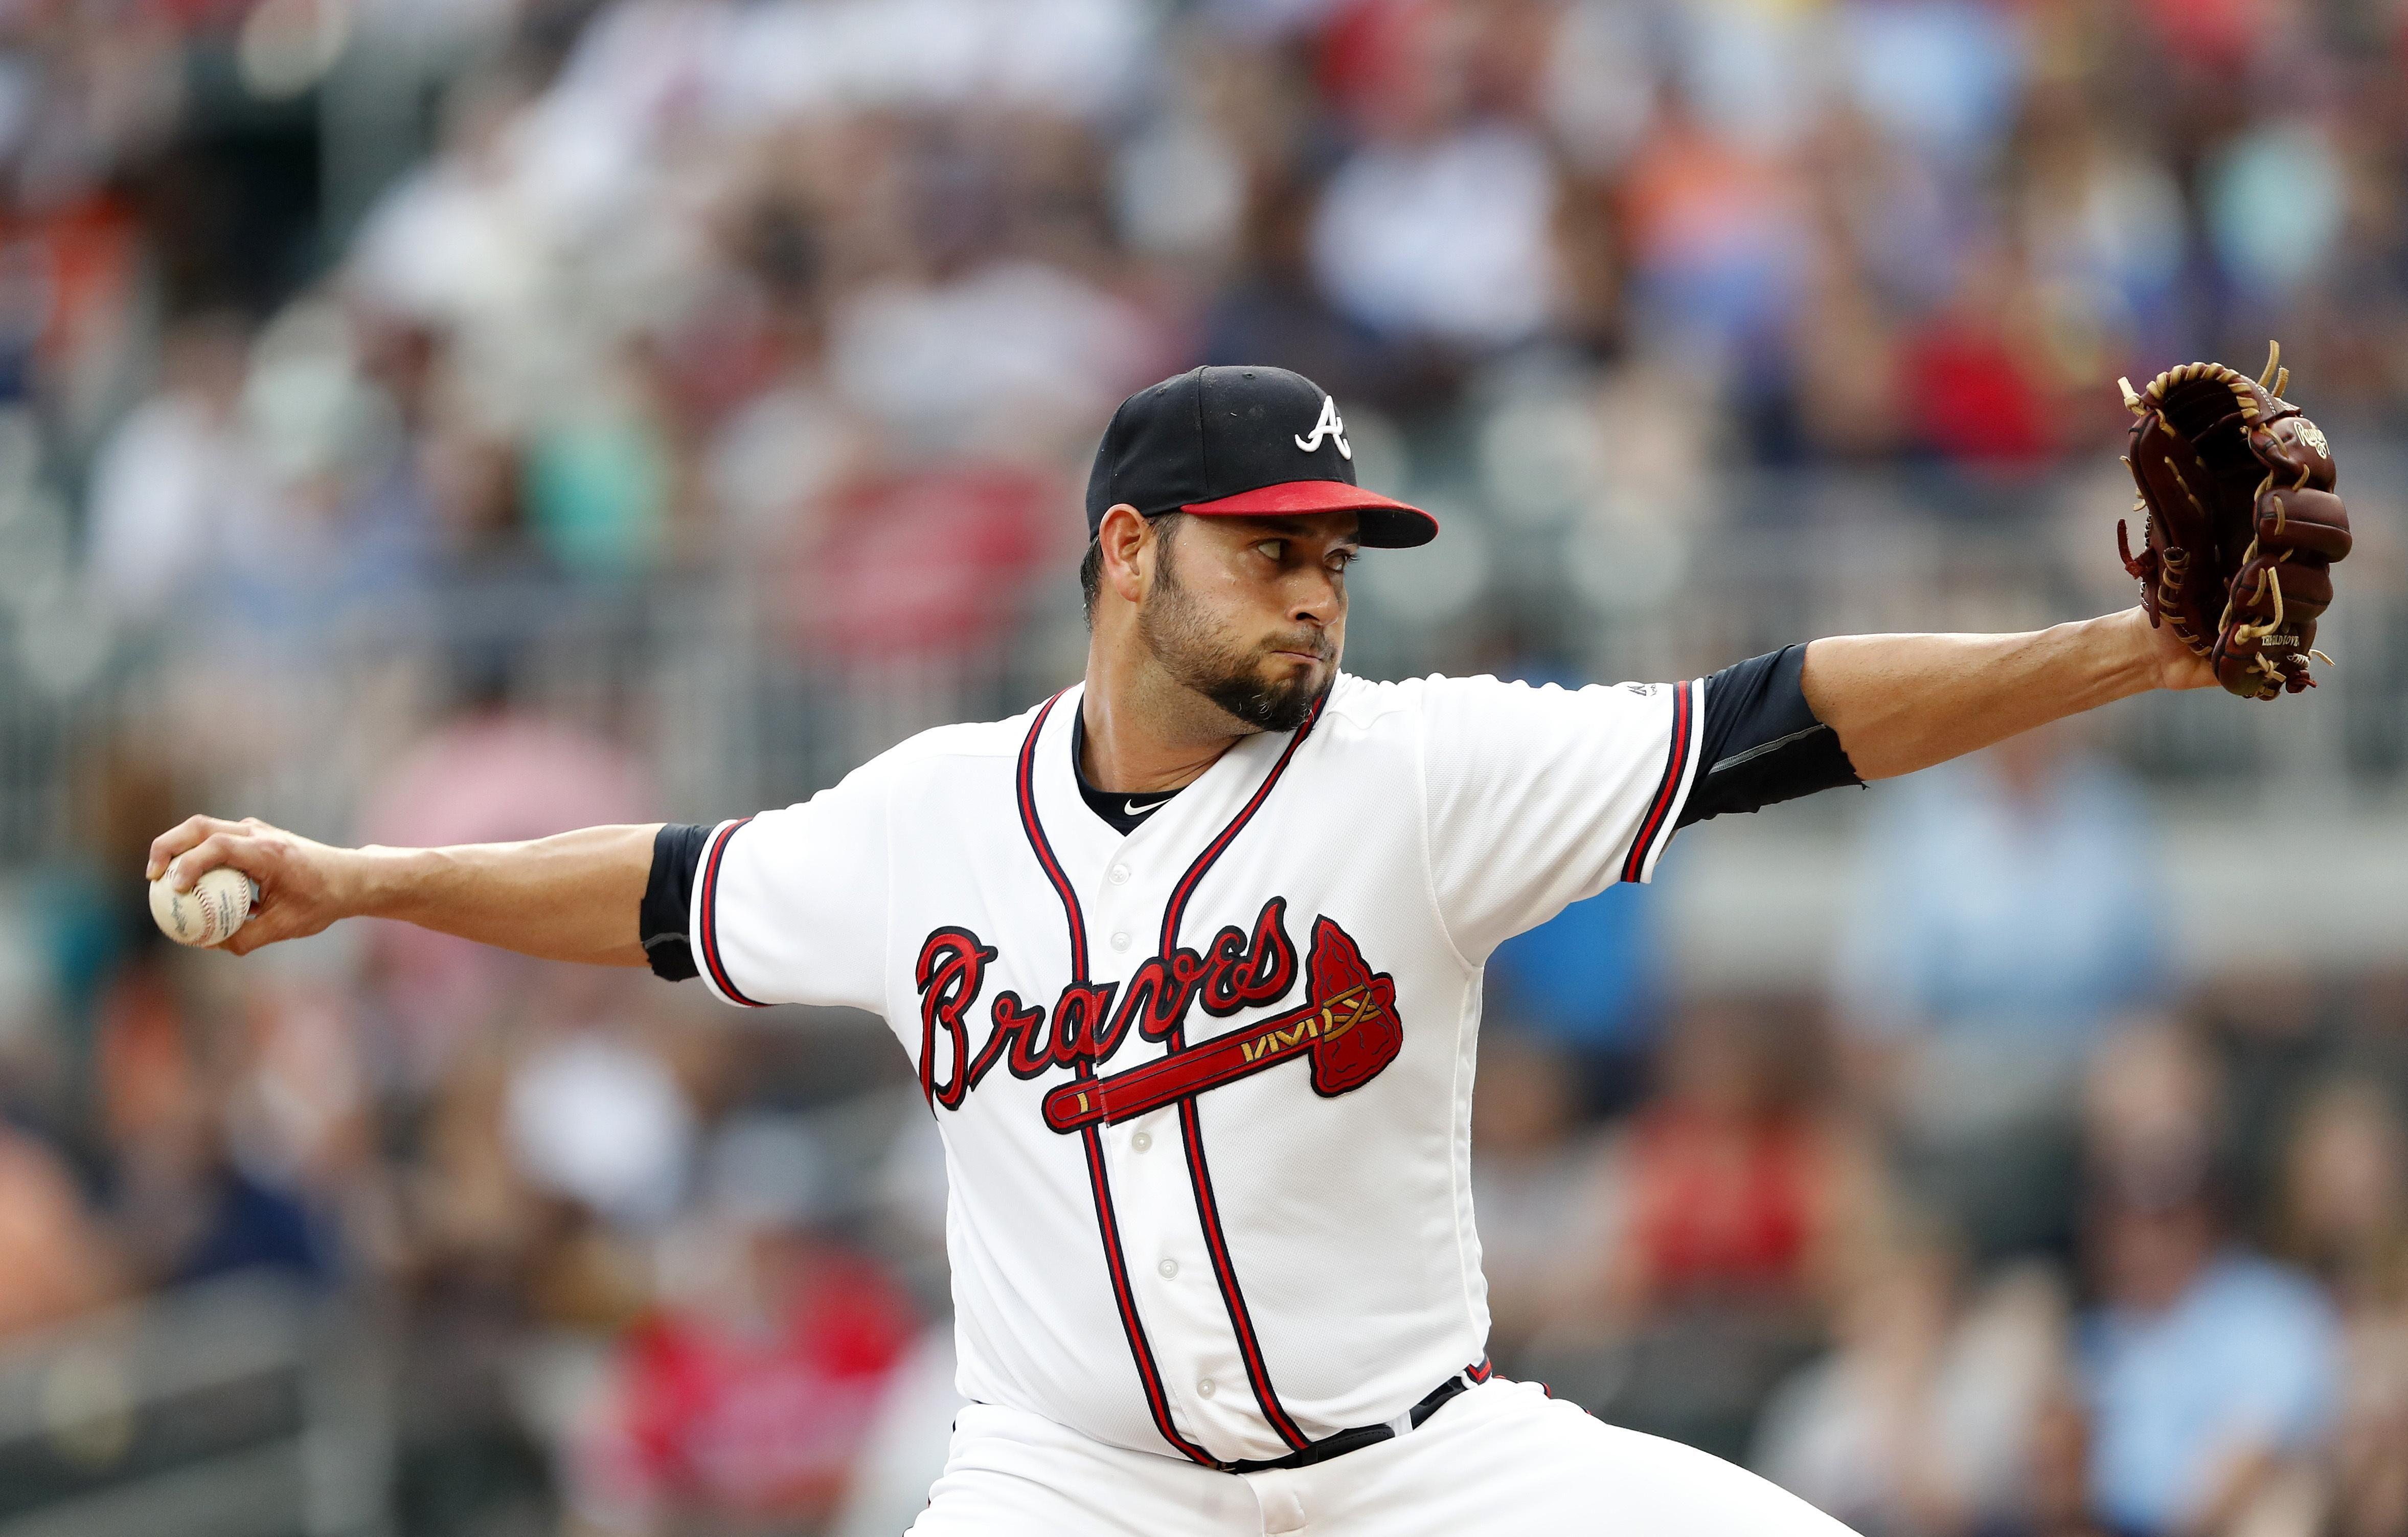 Atlanta Braves starting pitcher Anibal Sanchez works in